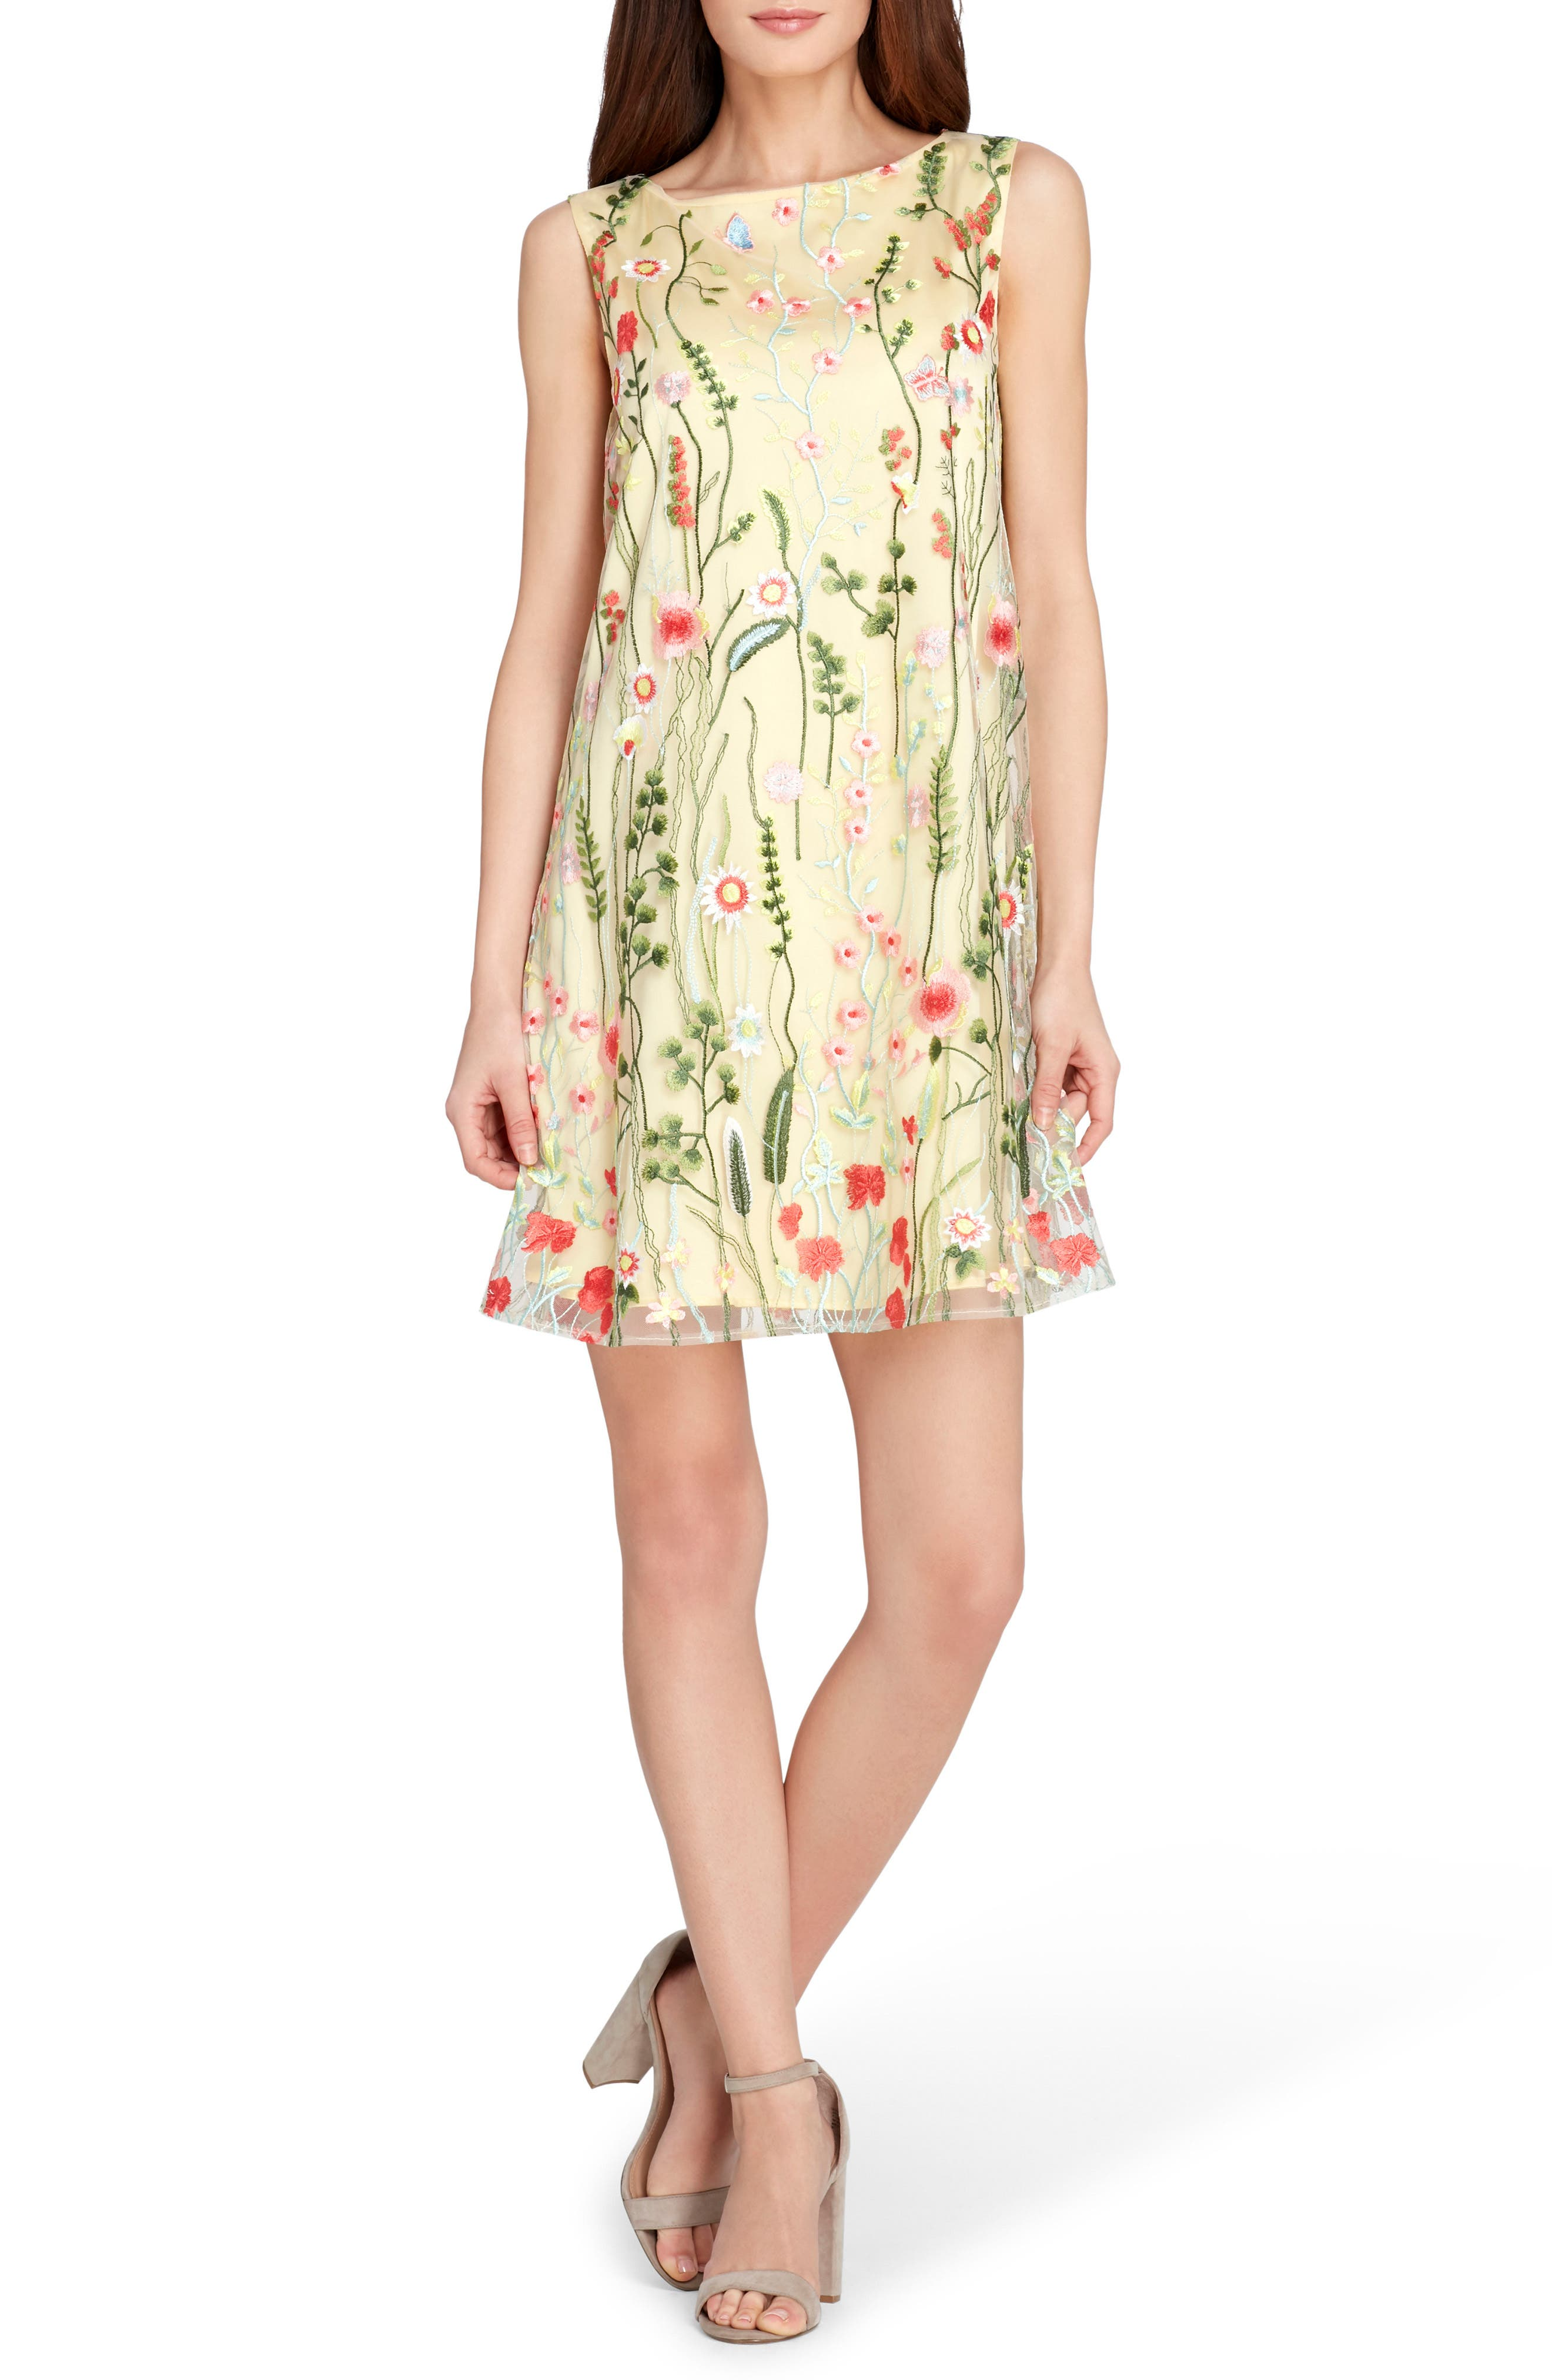 Embroidered Shift Dress,                             Main thumbnail 1, color,                             Gold/ Blush/ Green